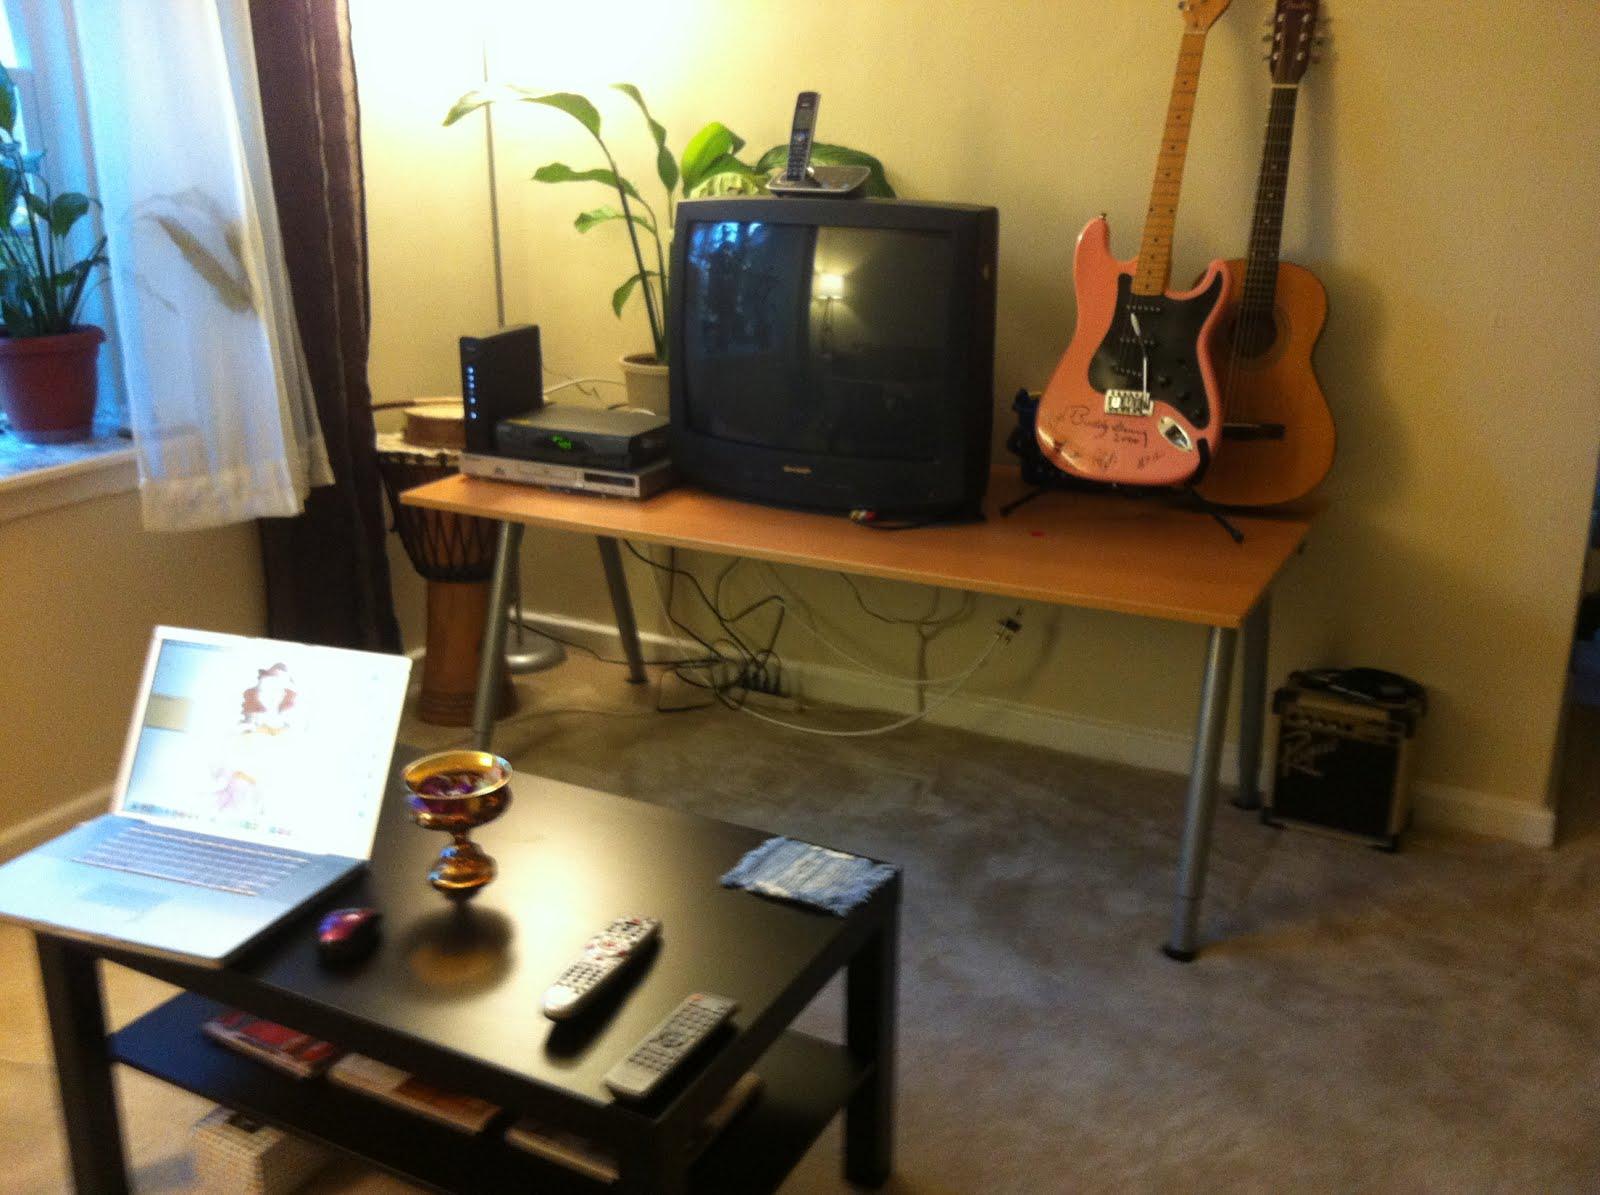 #A1862A Mini Galant And Media Stand ~ Get Home Decorating 6559 decoration table de noel ikea 1600x1195 px @ aertt.com